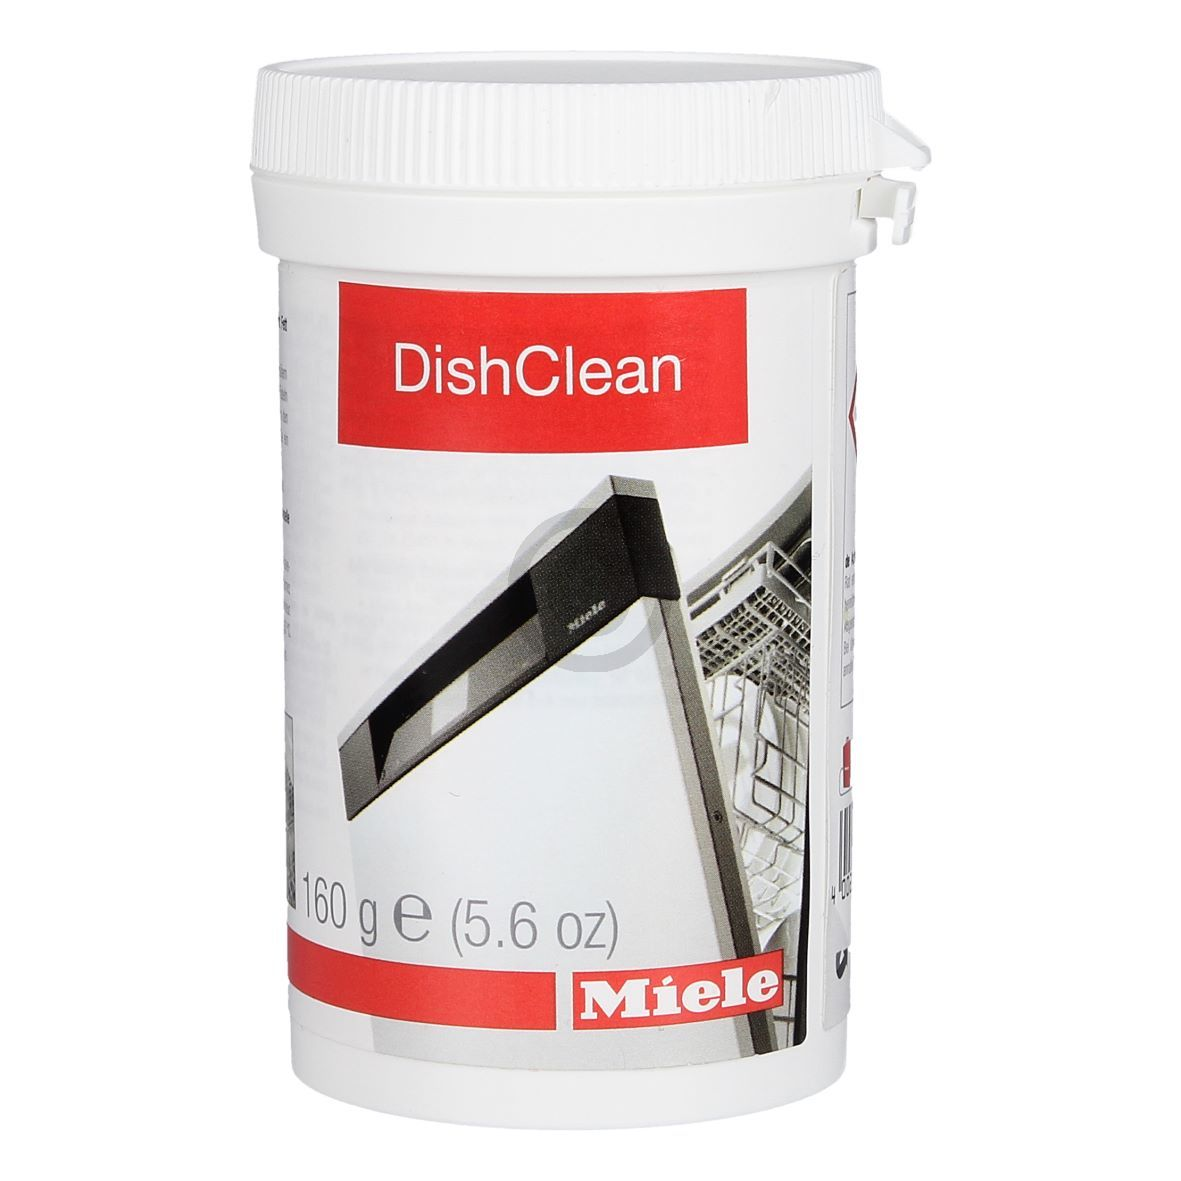 Spülmaschinen-Pflegemittel Miele DishClean 160g 10161260 Miele